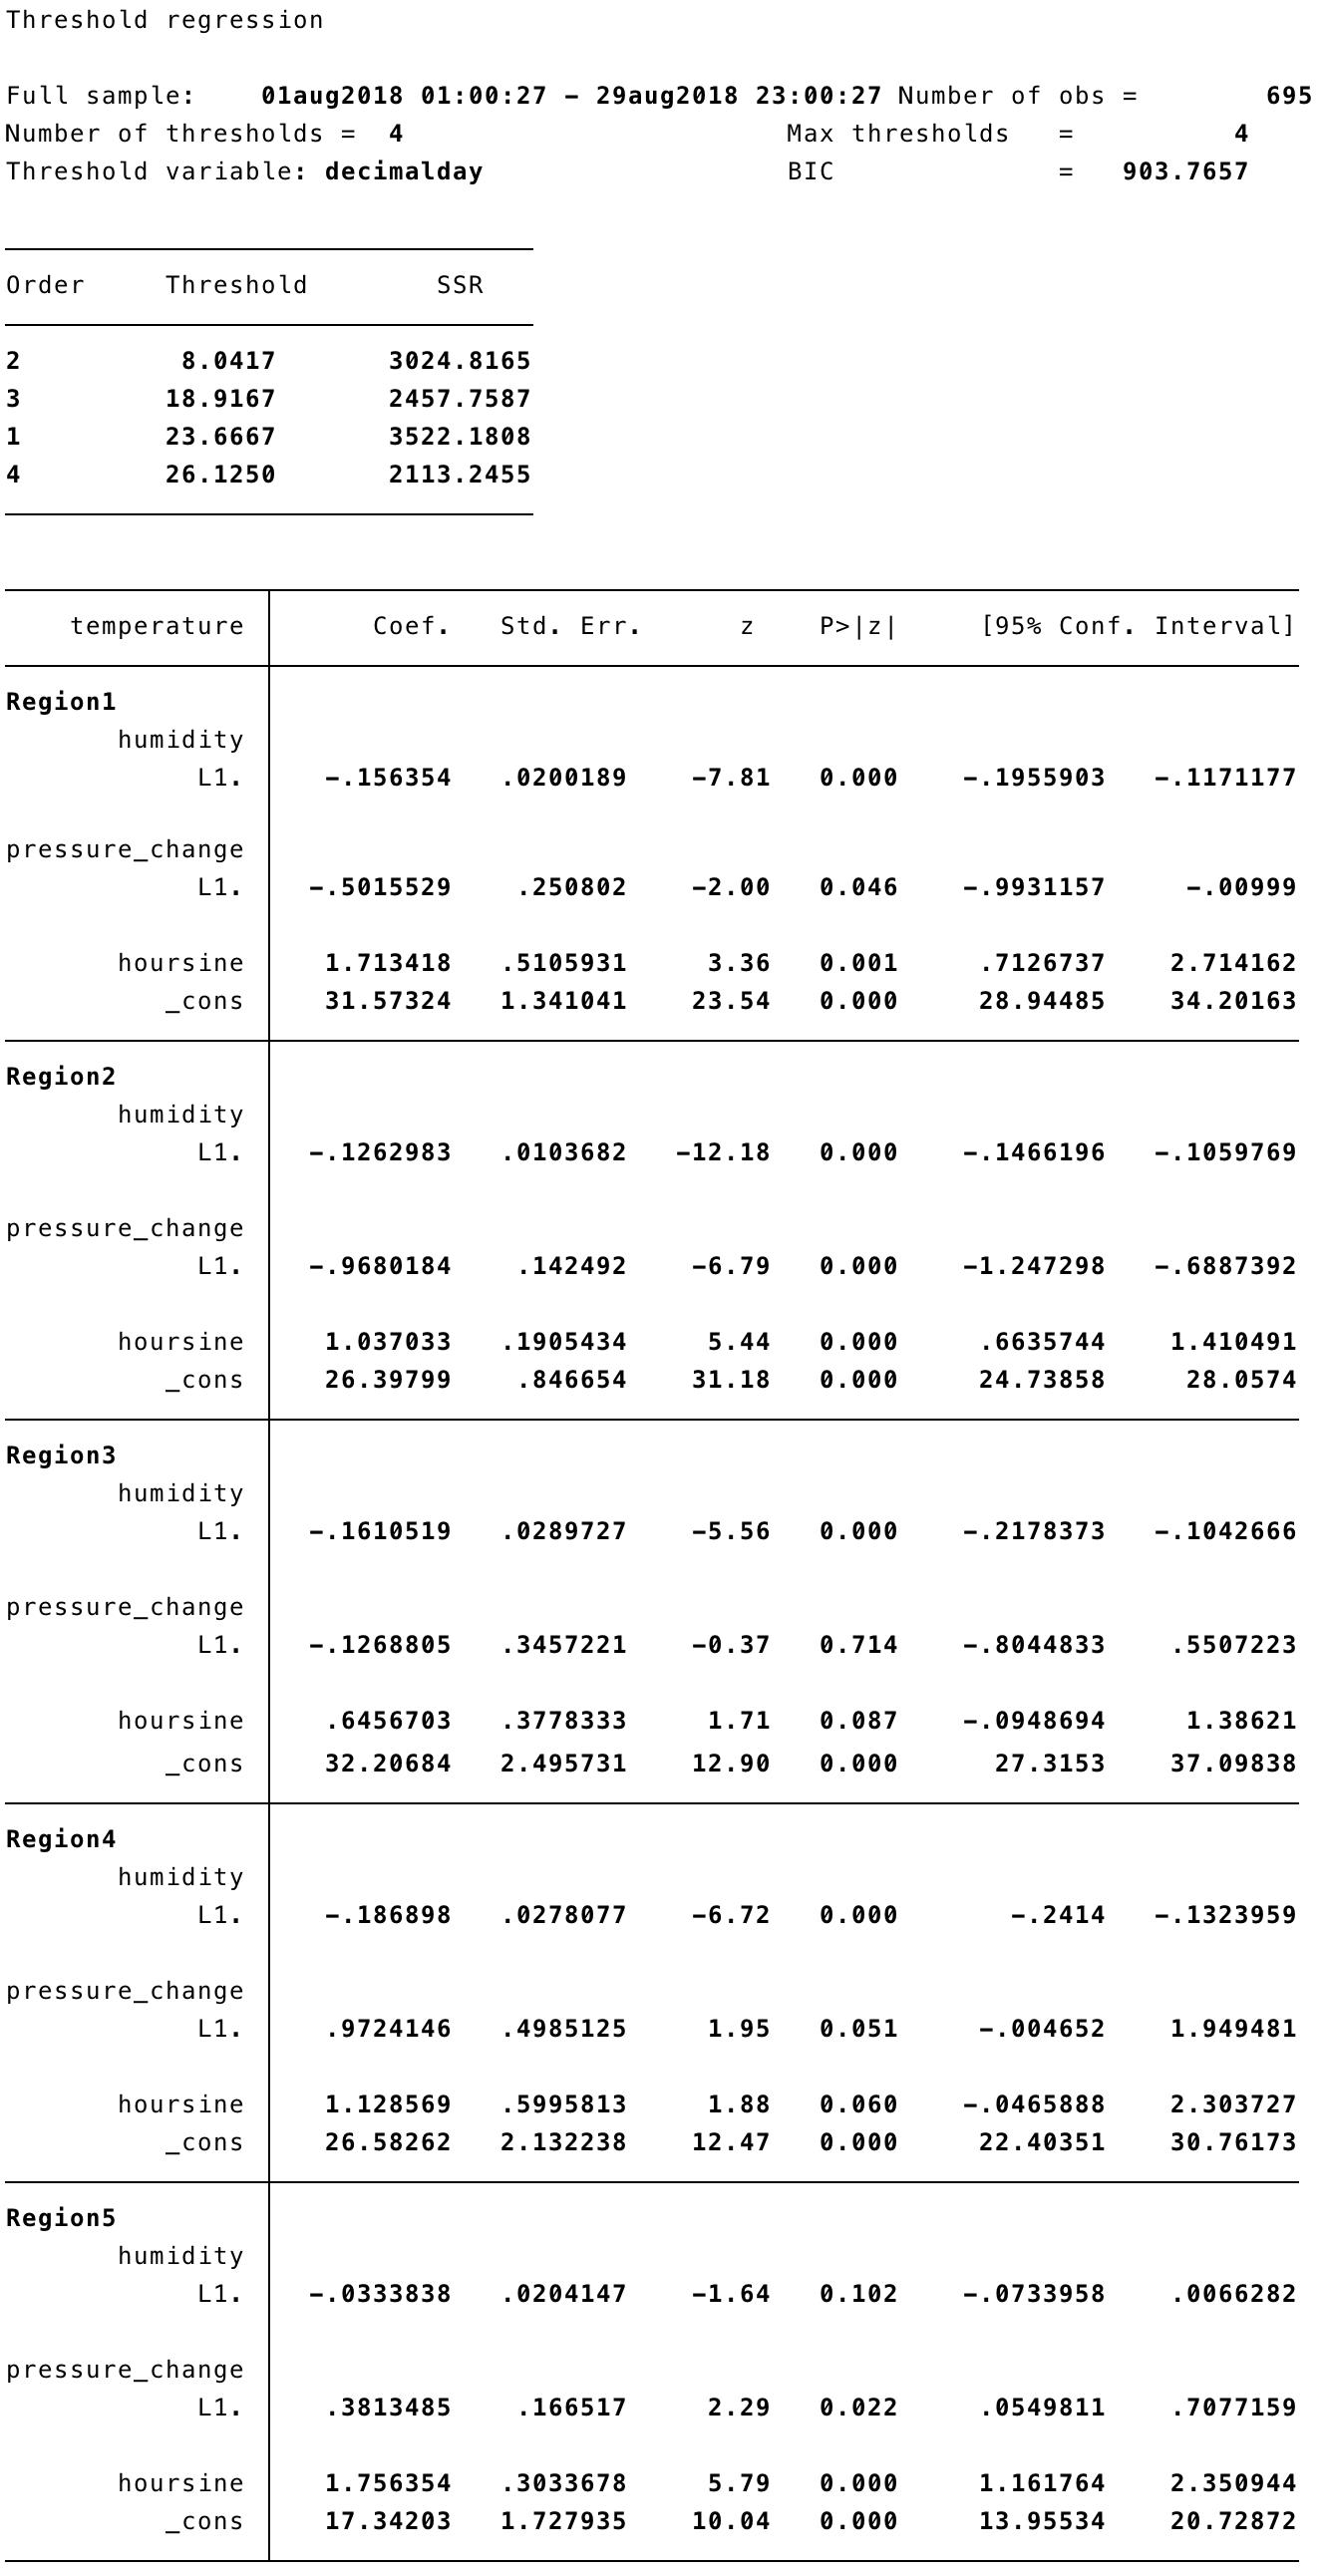 threshold regression of temperature on three predictors, four thresholds